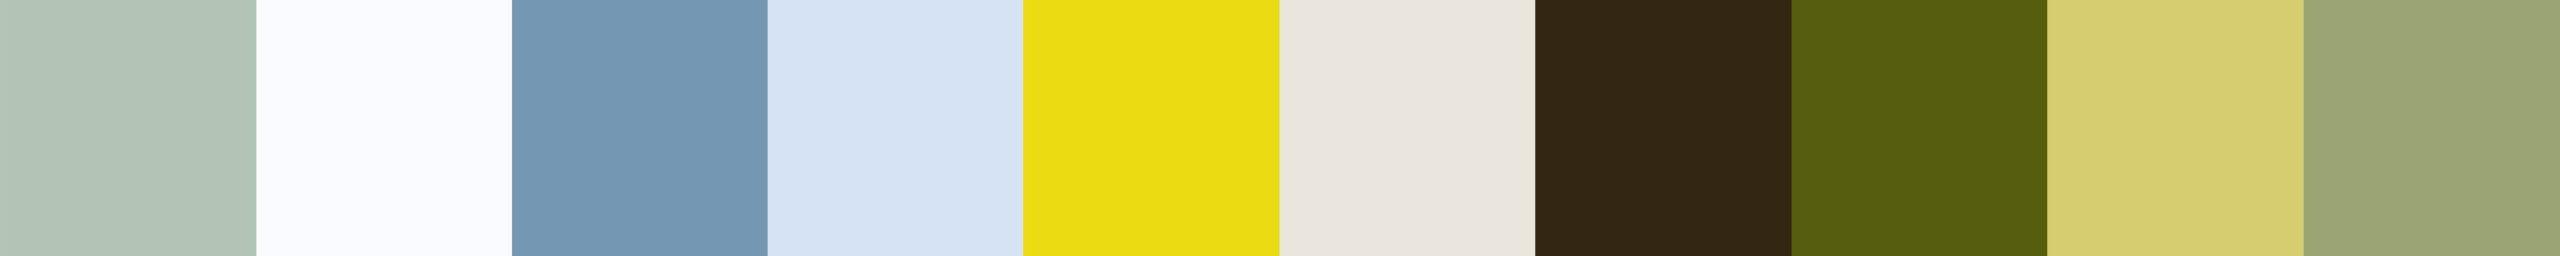 70 Peroudia Color Palette